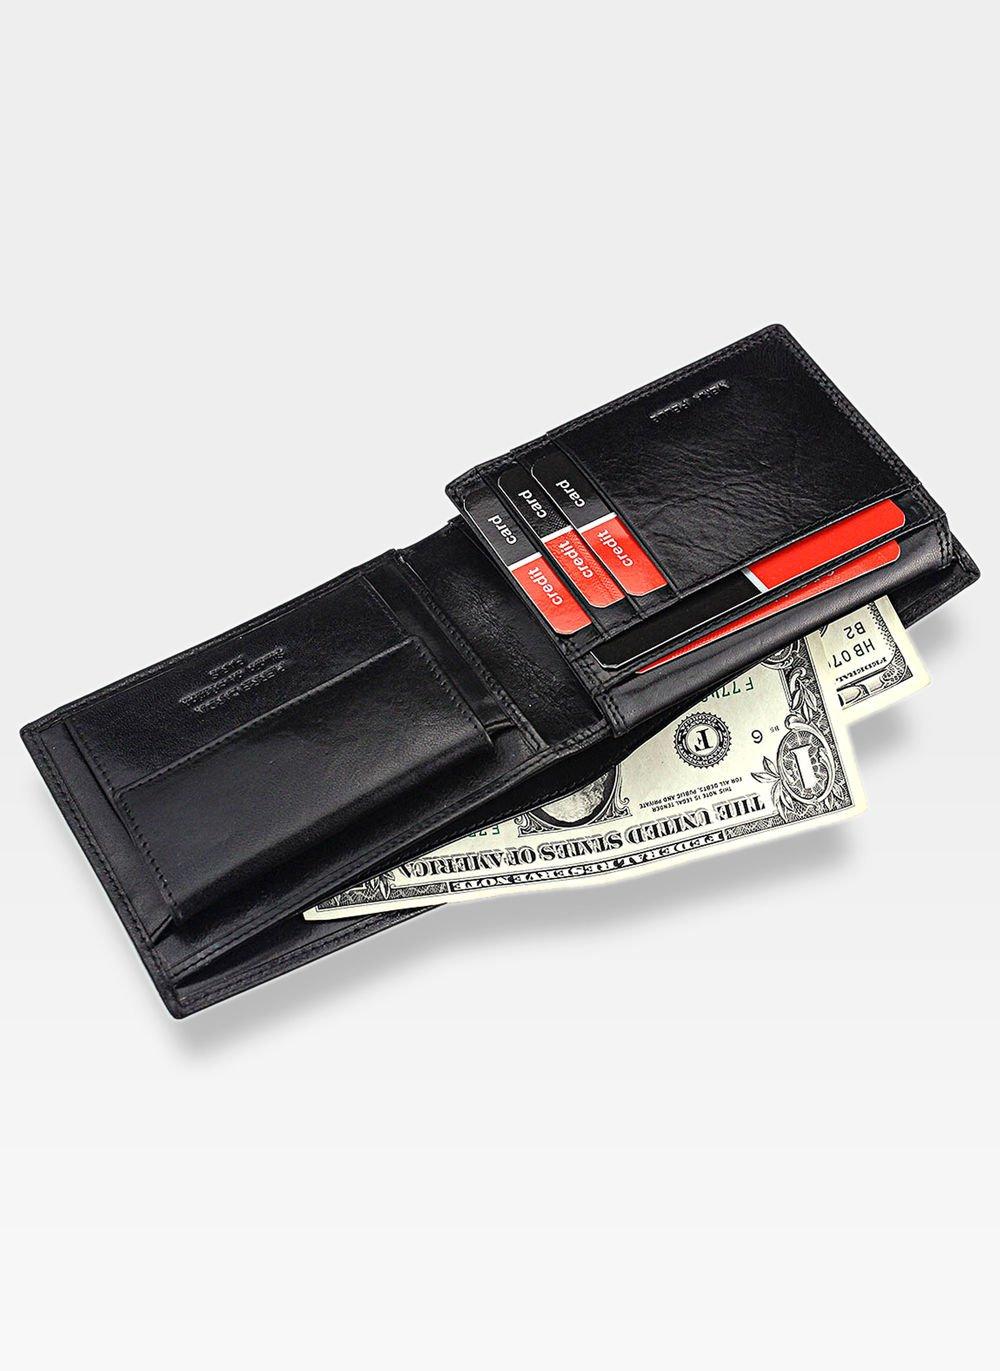 fb4c3561b0f41 Portfel Męski Pierre Cardin ys520.1 8806 + Ninja Card Zestaw Na ...